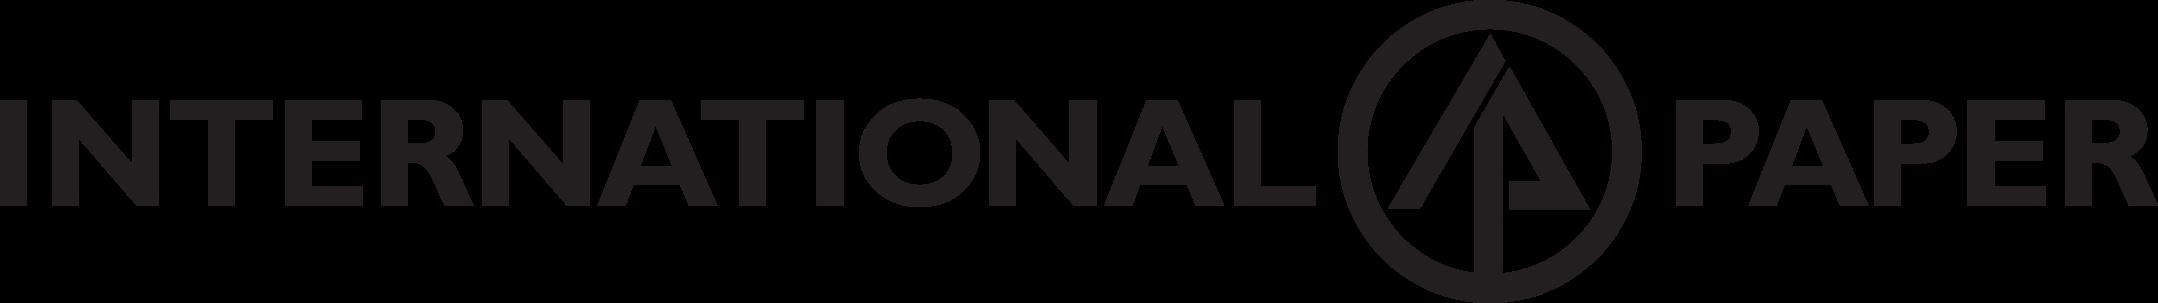 international paper logo 1 - International Paper Logo